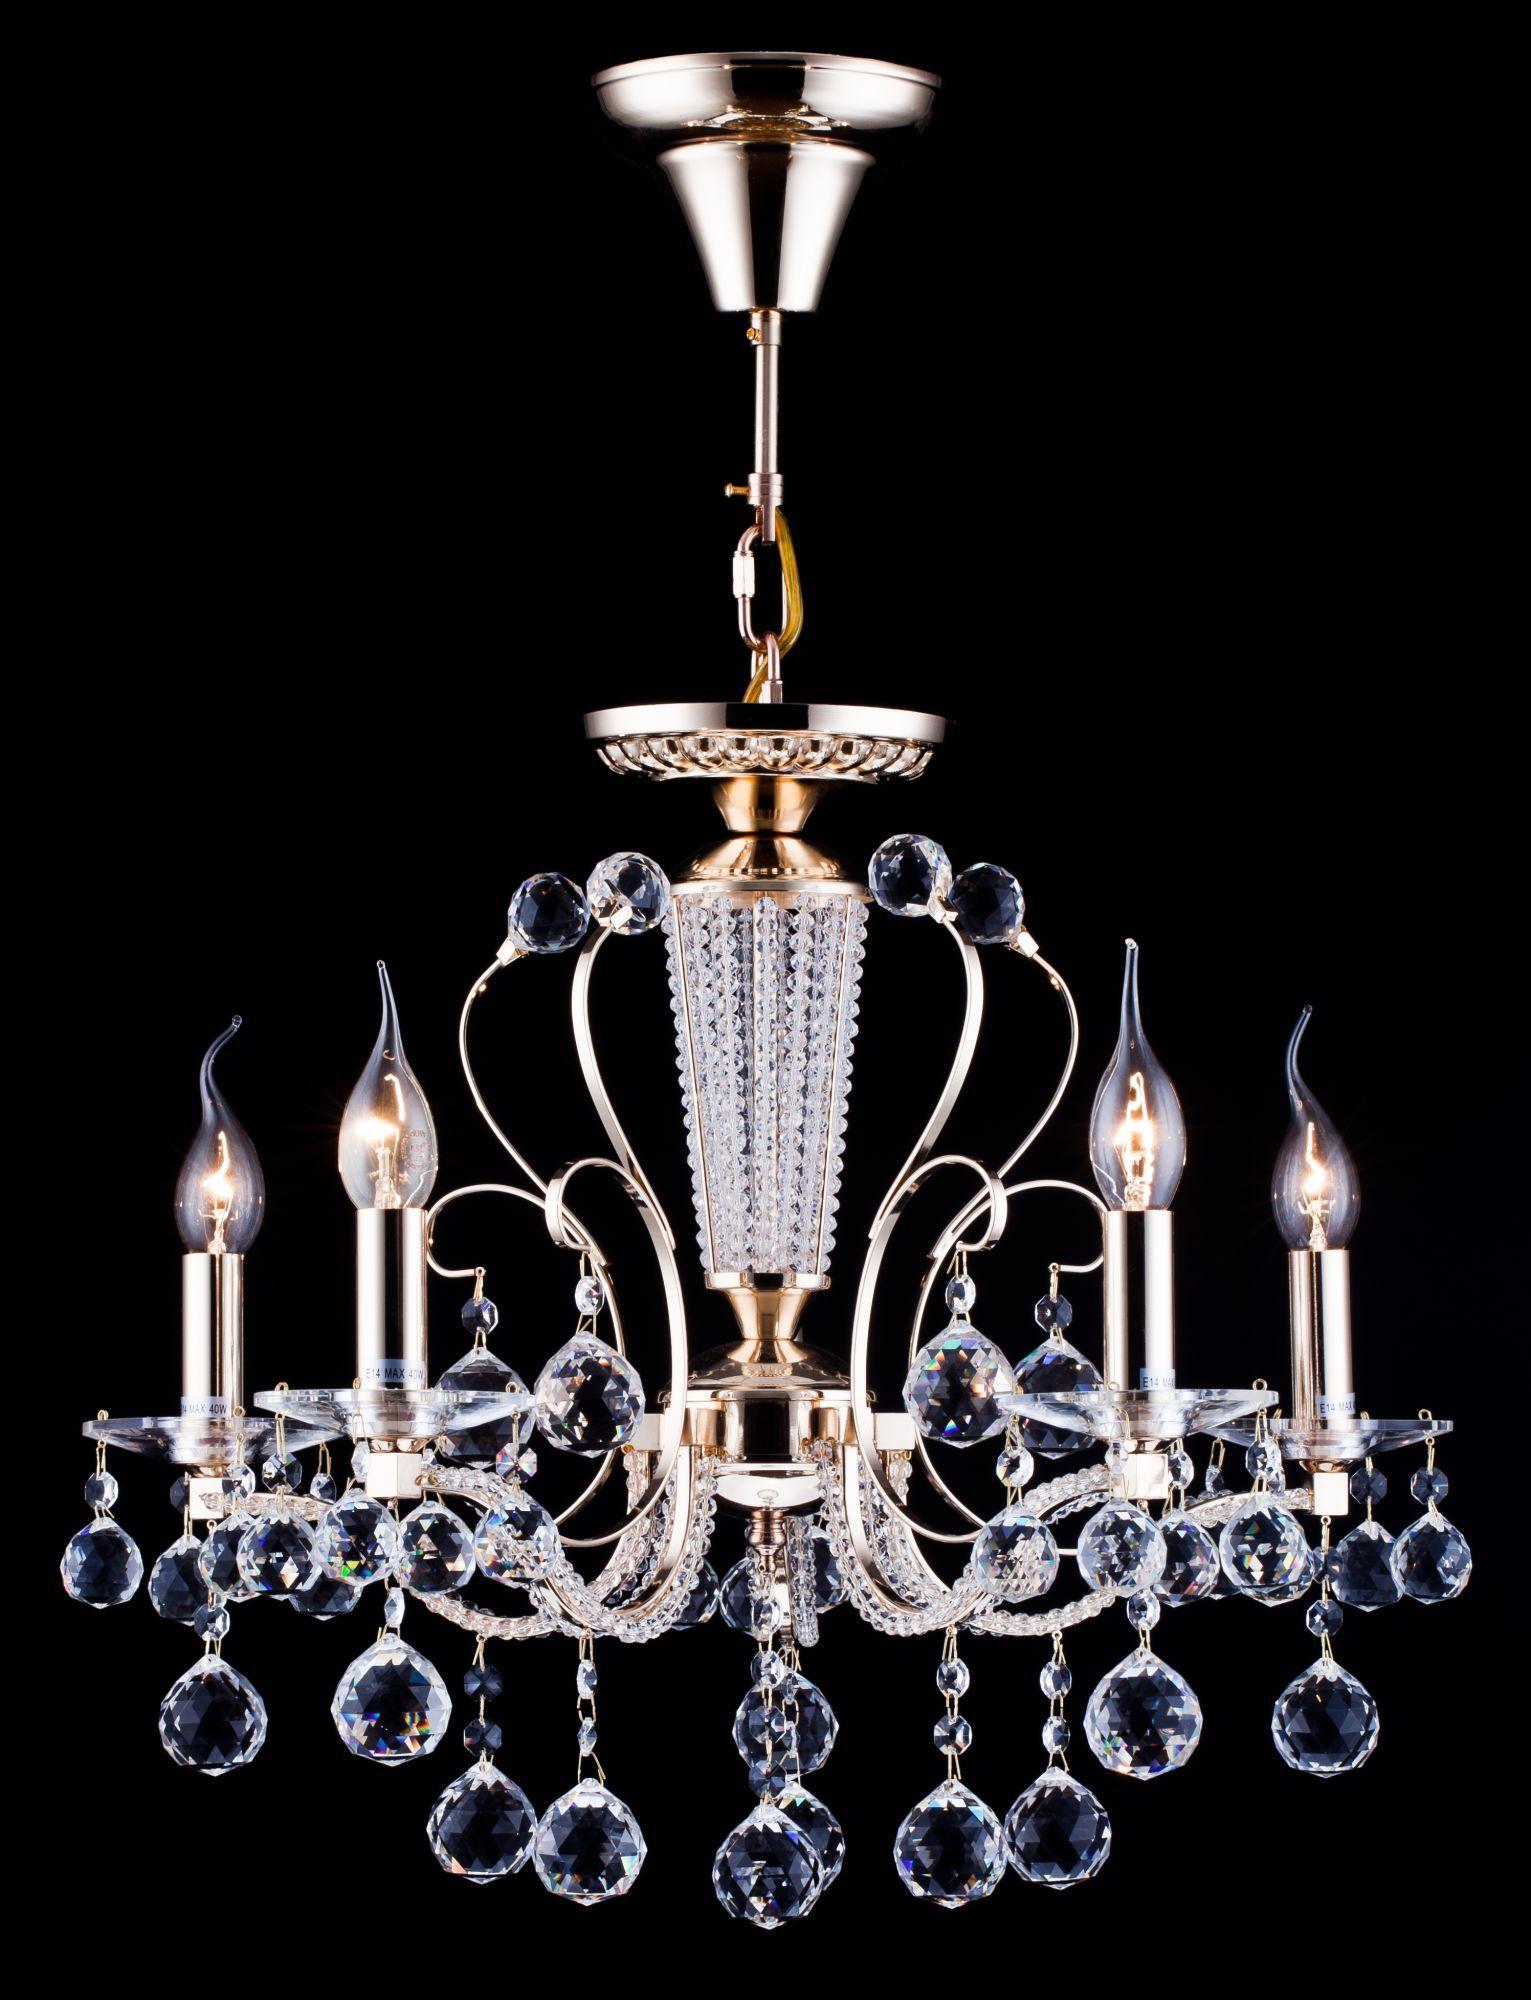 Потолочно-подвесная люстра Freya Marlin FR1130-PL-05-G (FR130-05-G), 5xE14x40W, золото с прозрачным, прозрачный с золотом, прозрачный, металл со стеклом, хрусталь - фото 4